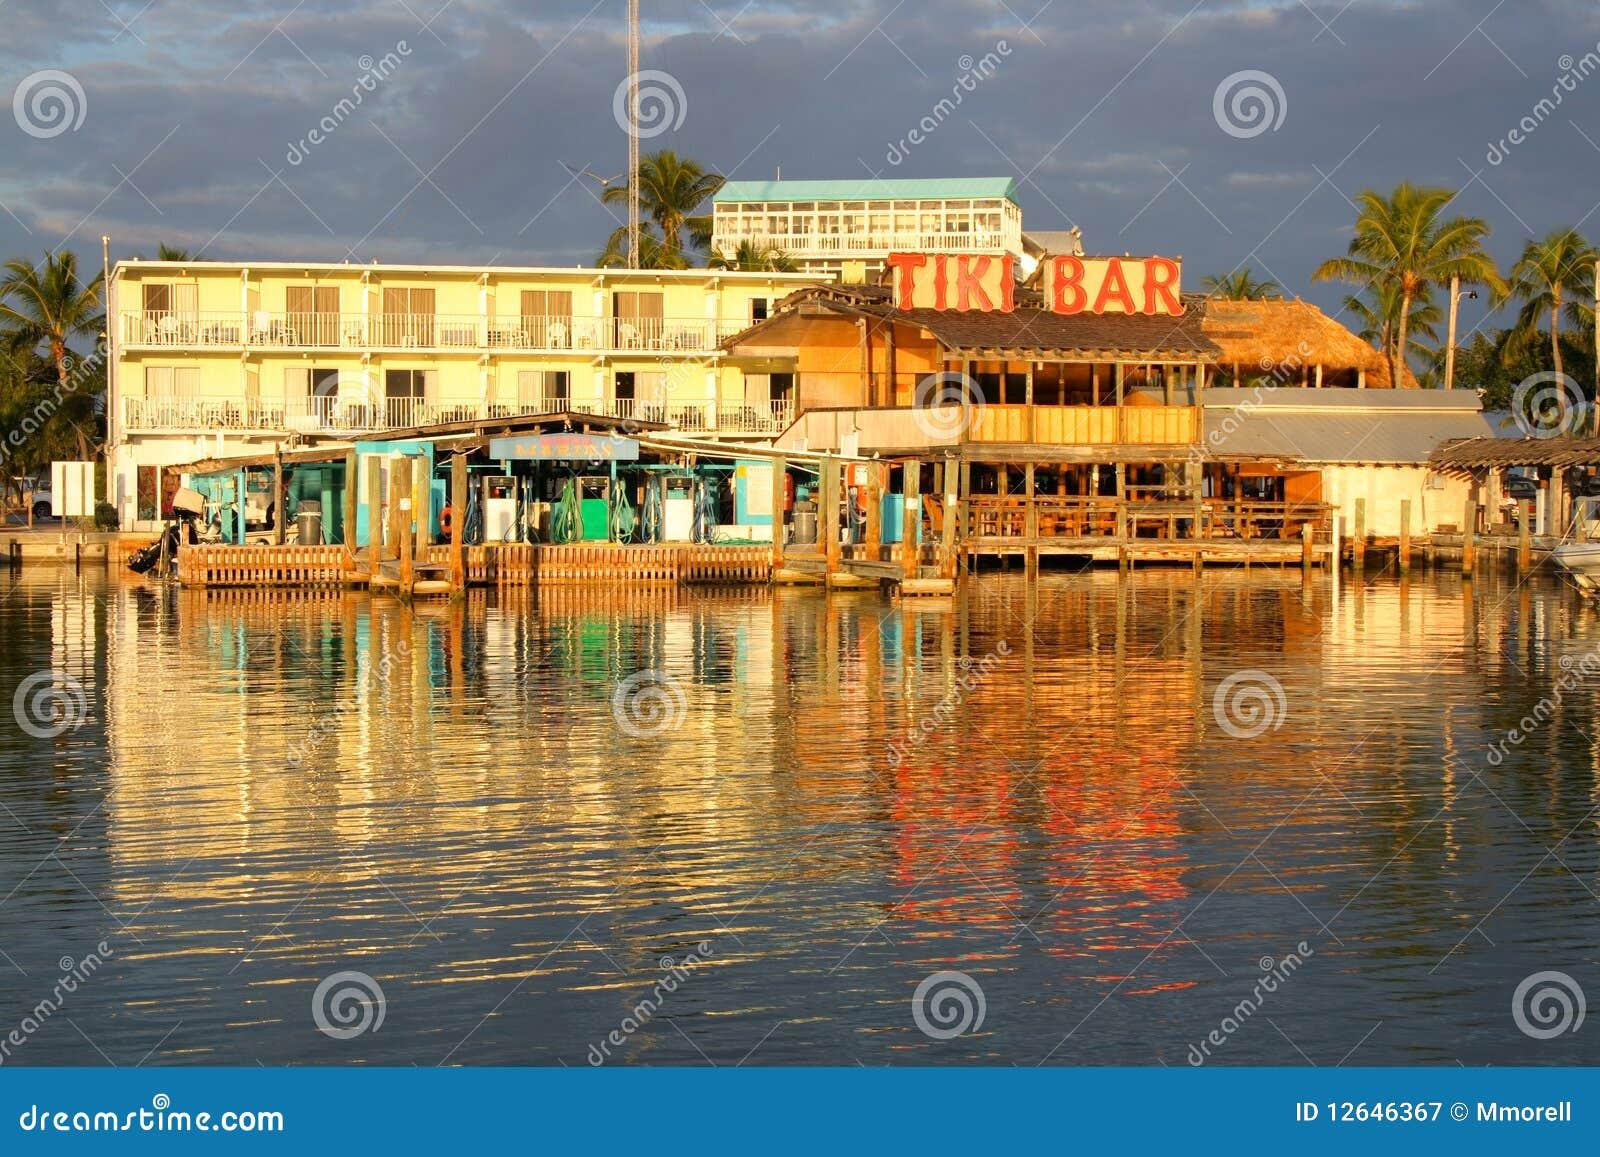 World famous tiki bar